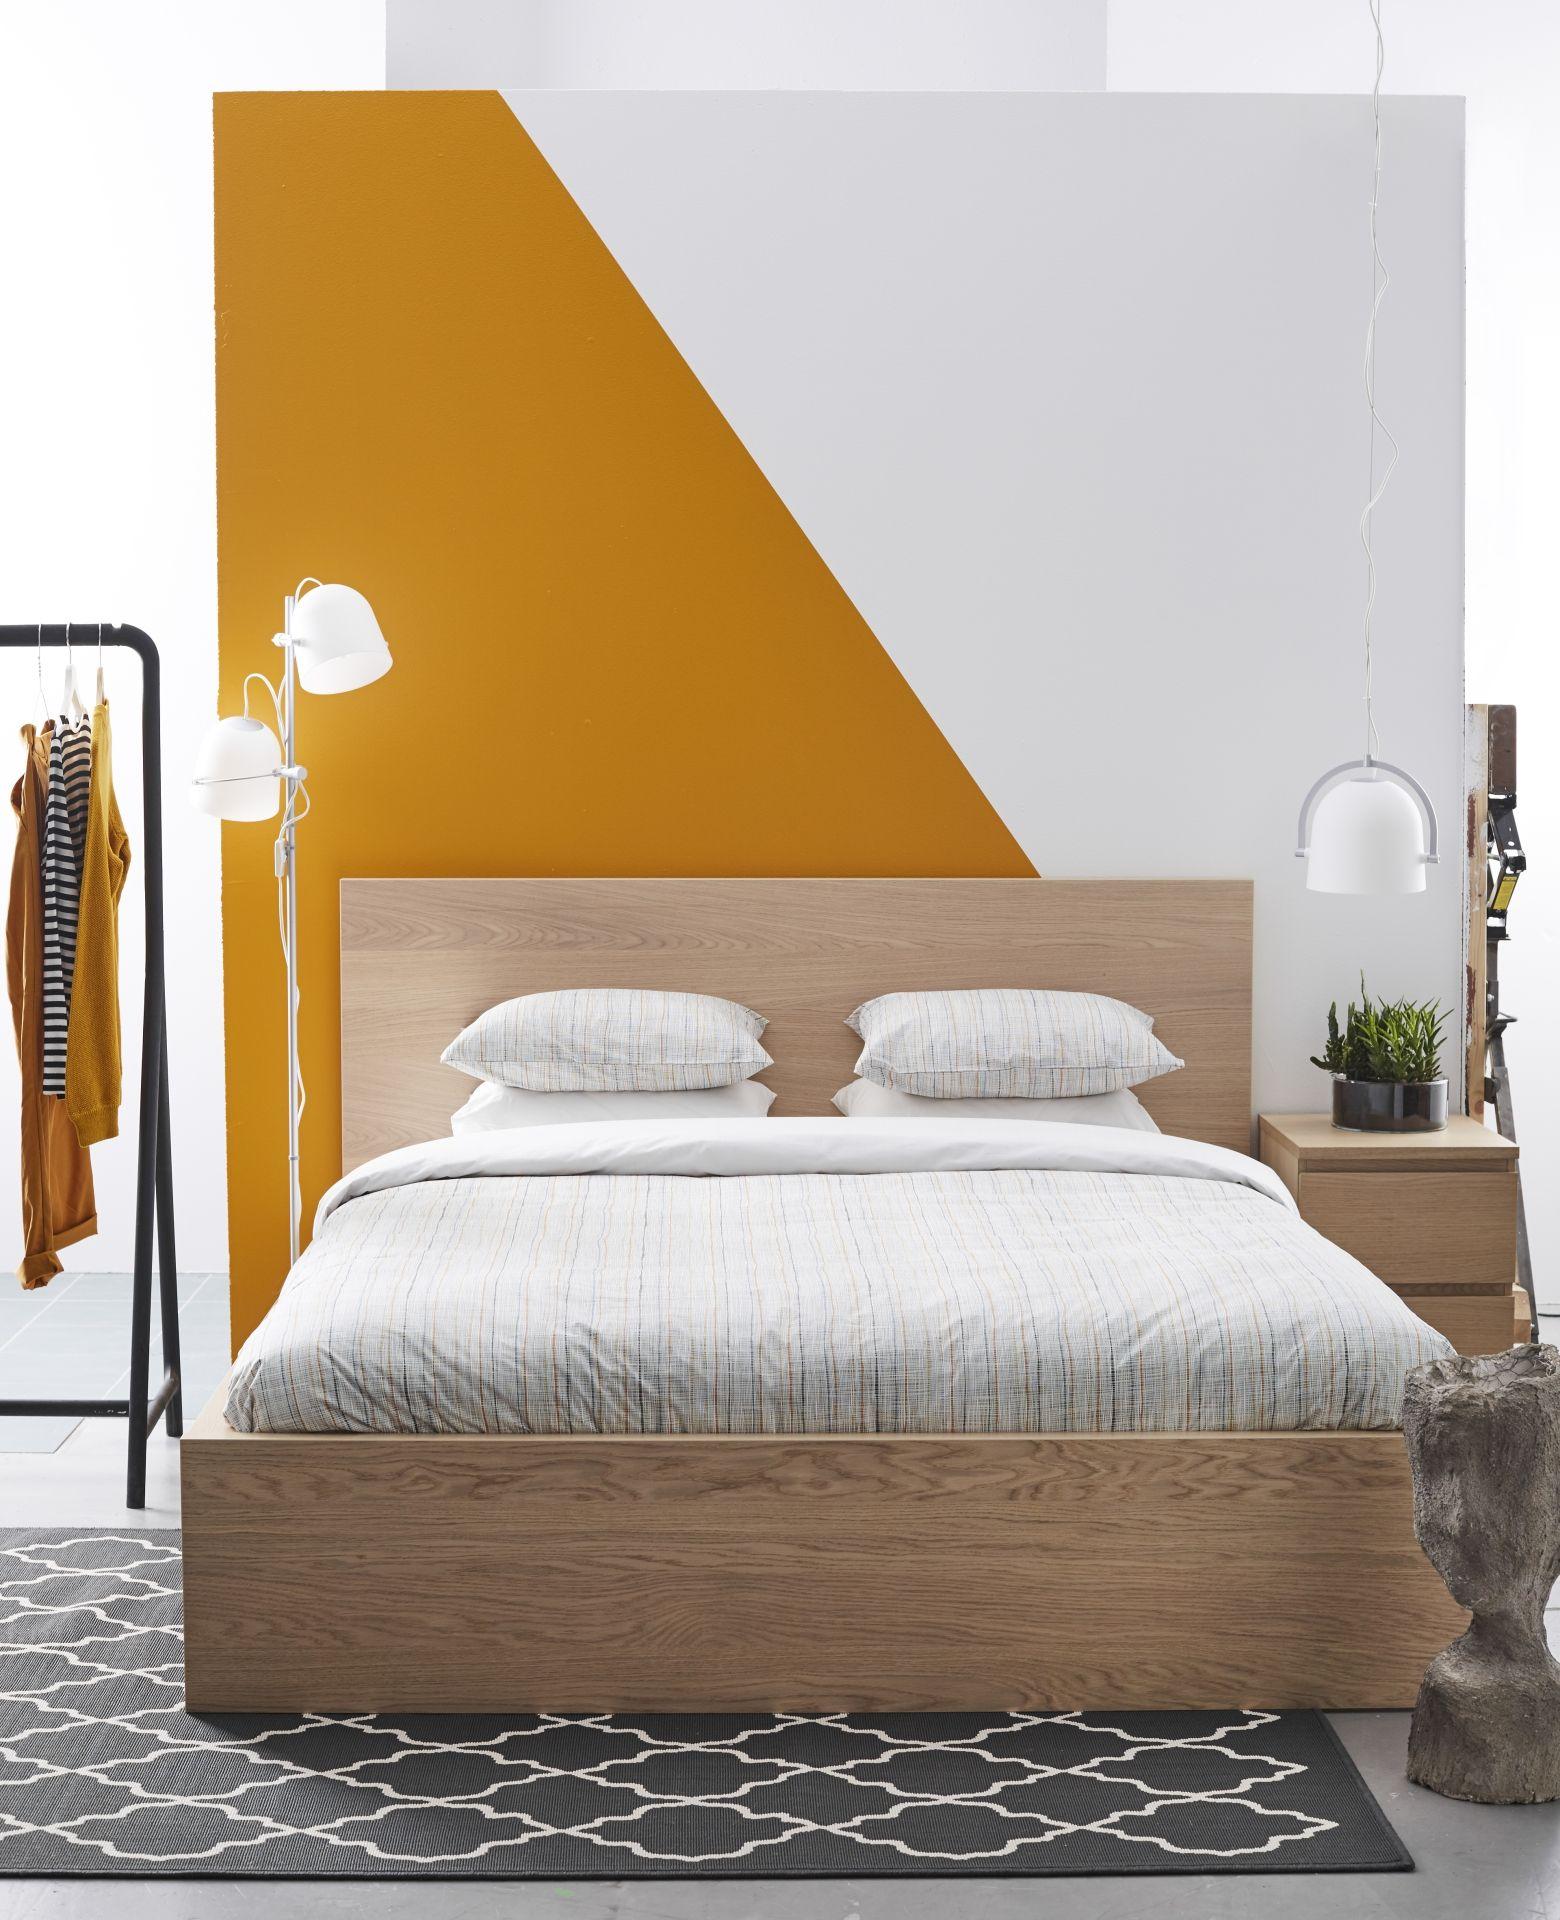 Malm bedframe ikea ikeanl ikeanederland bed inspiratie for Slaapkamer bed